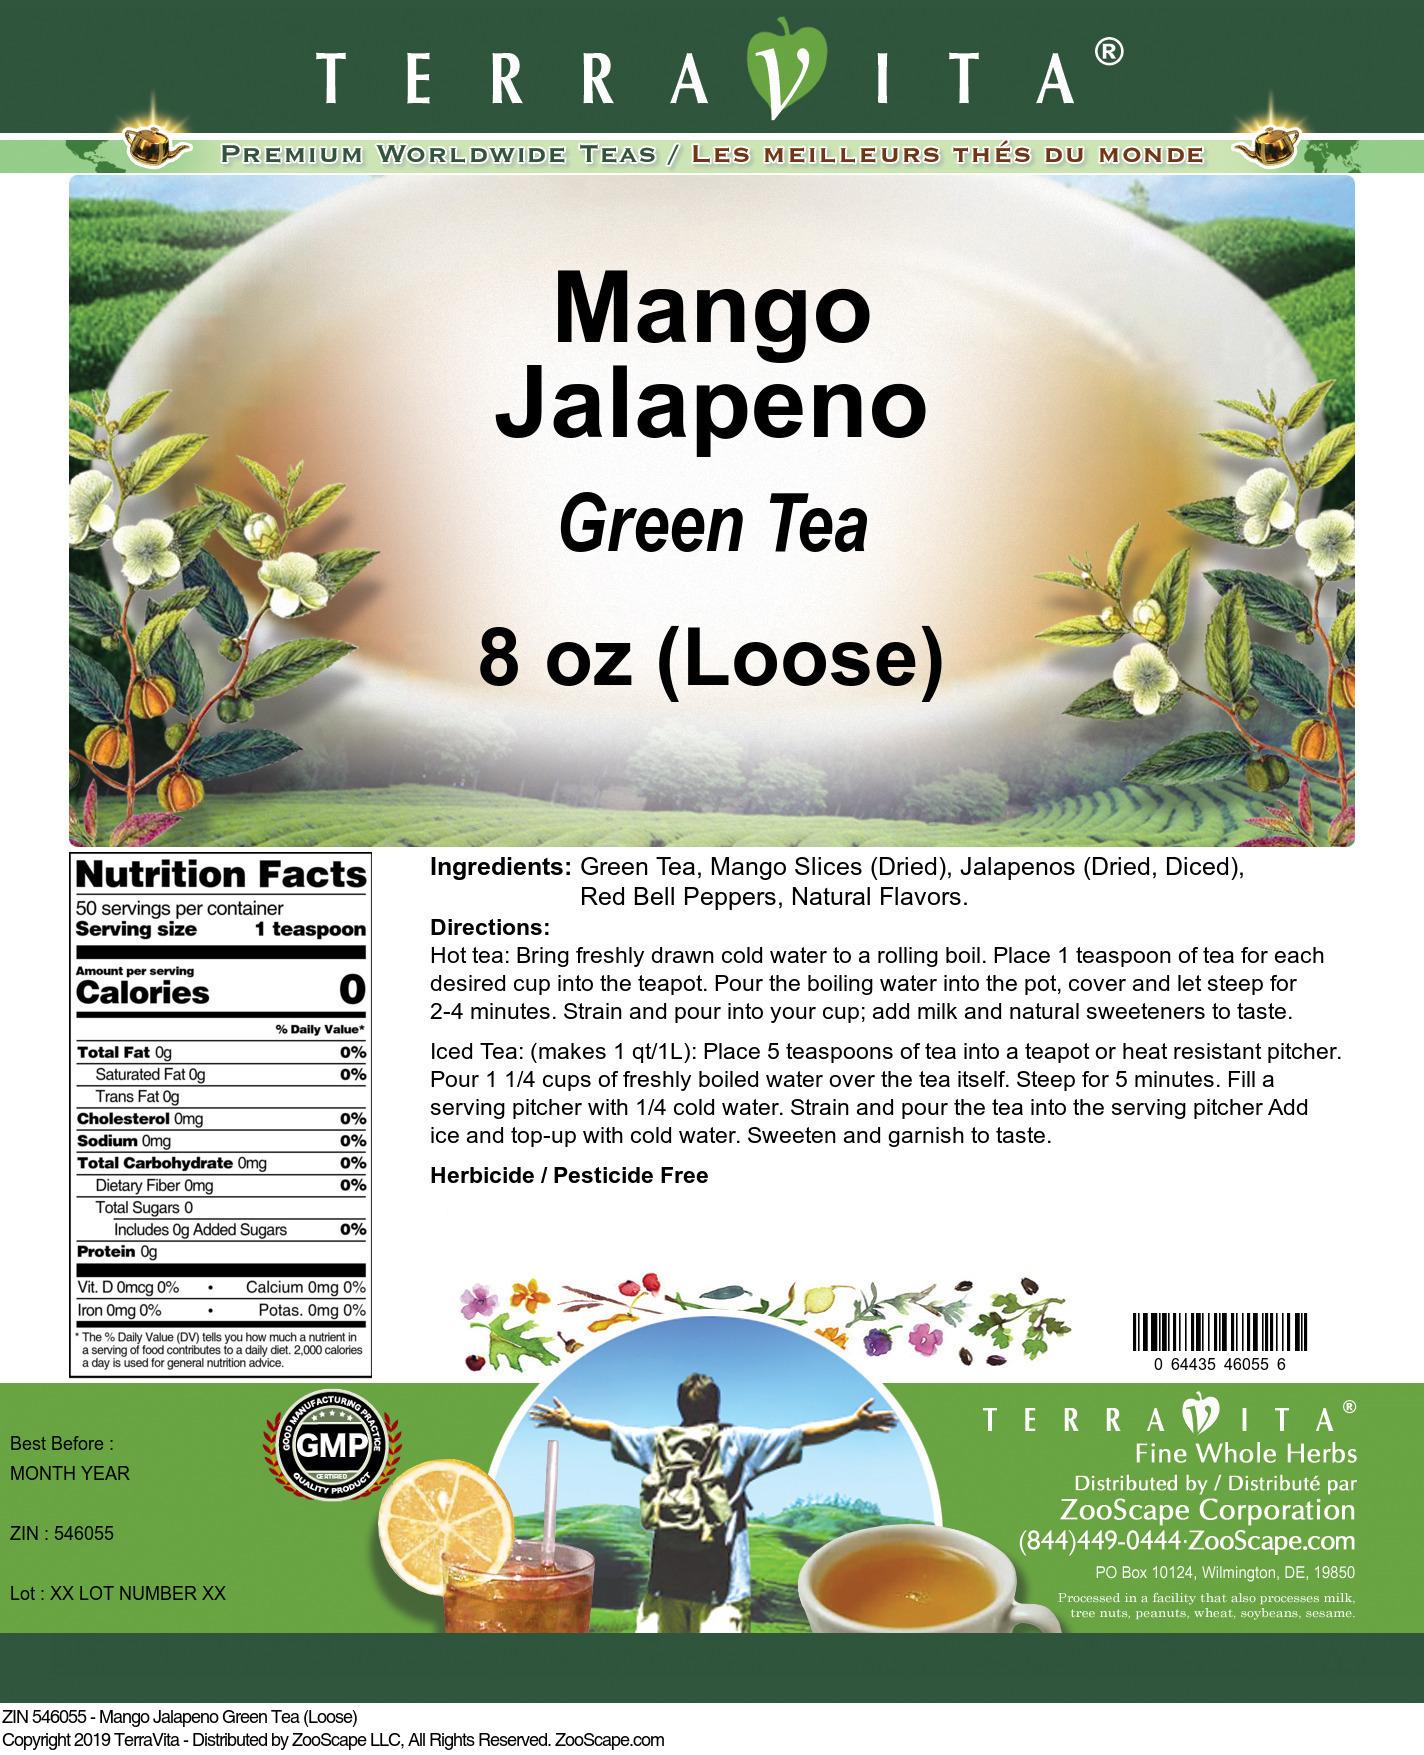 Mango Jalapeno Green Tea